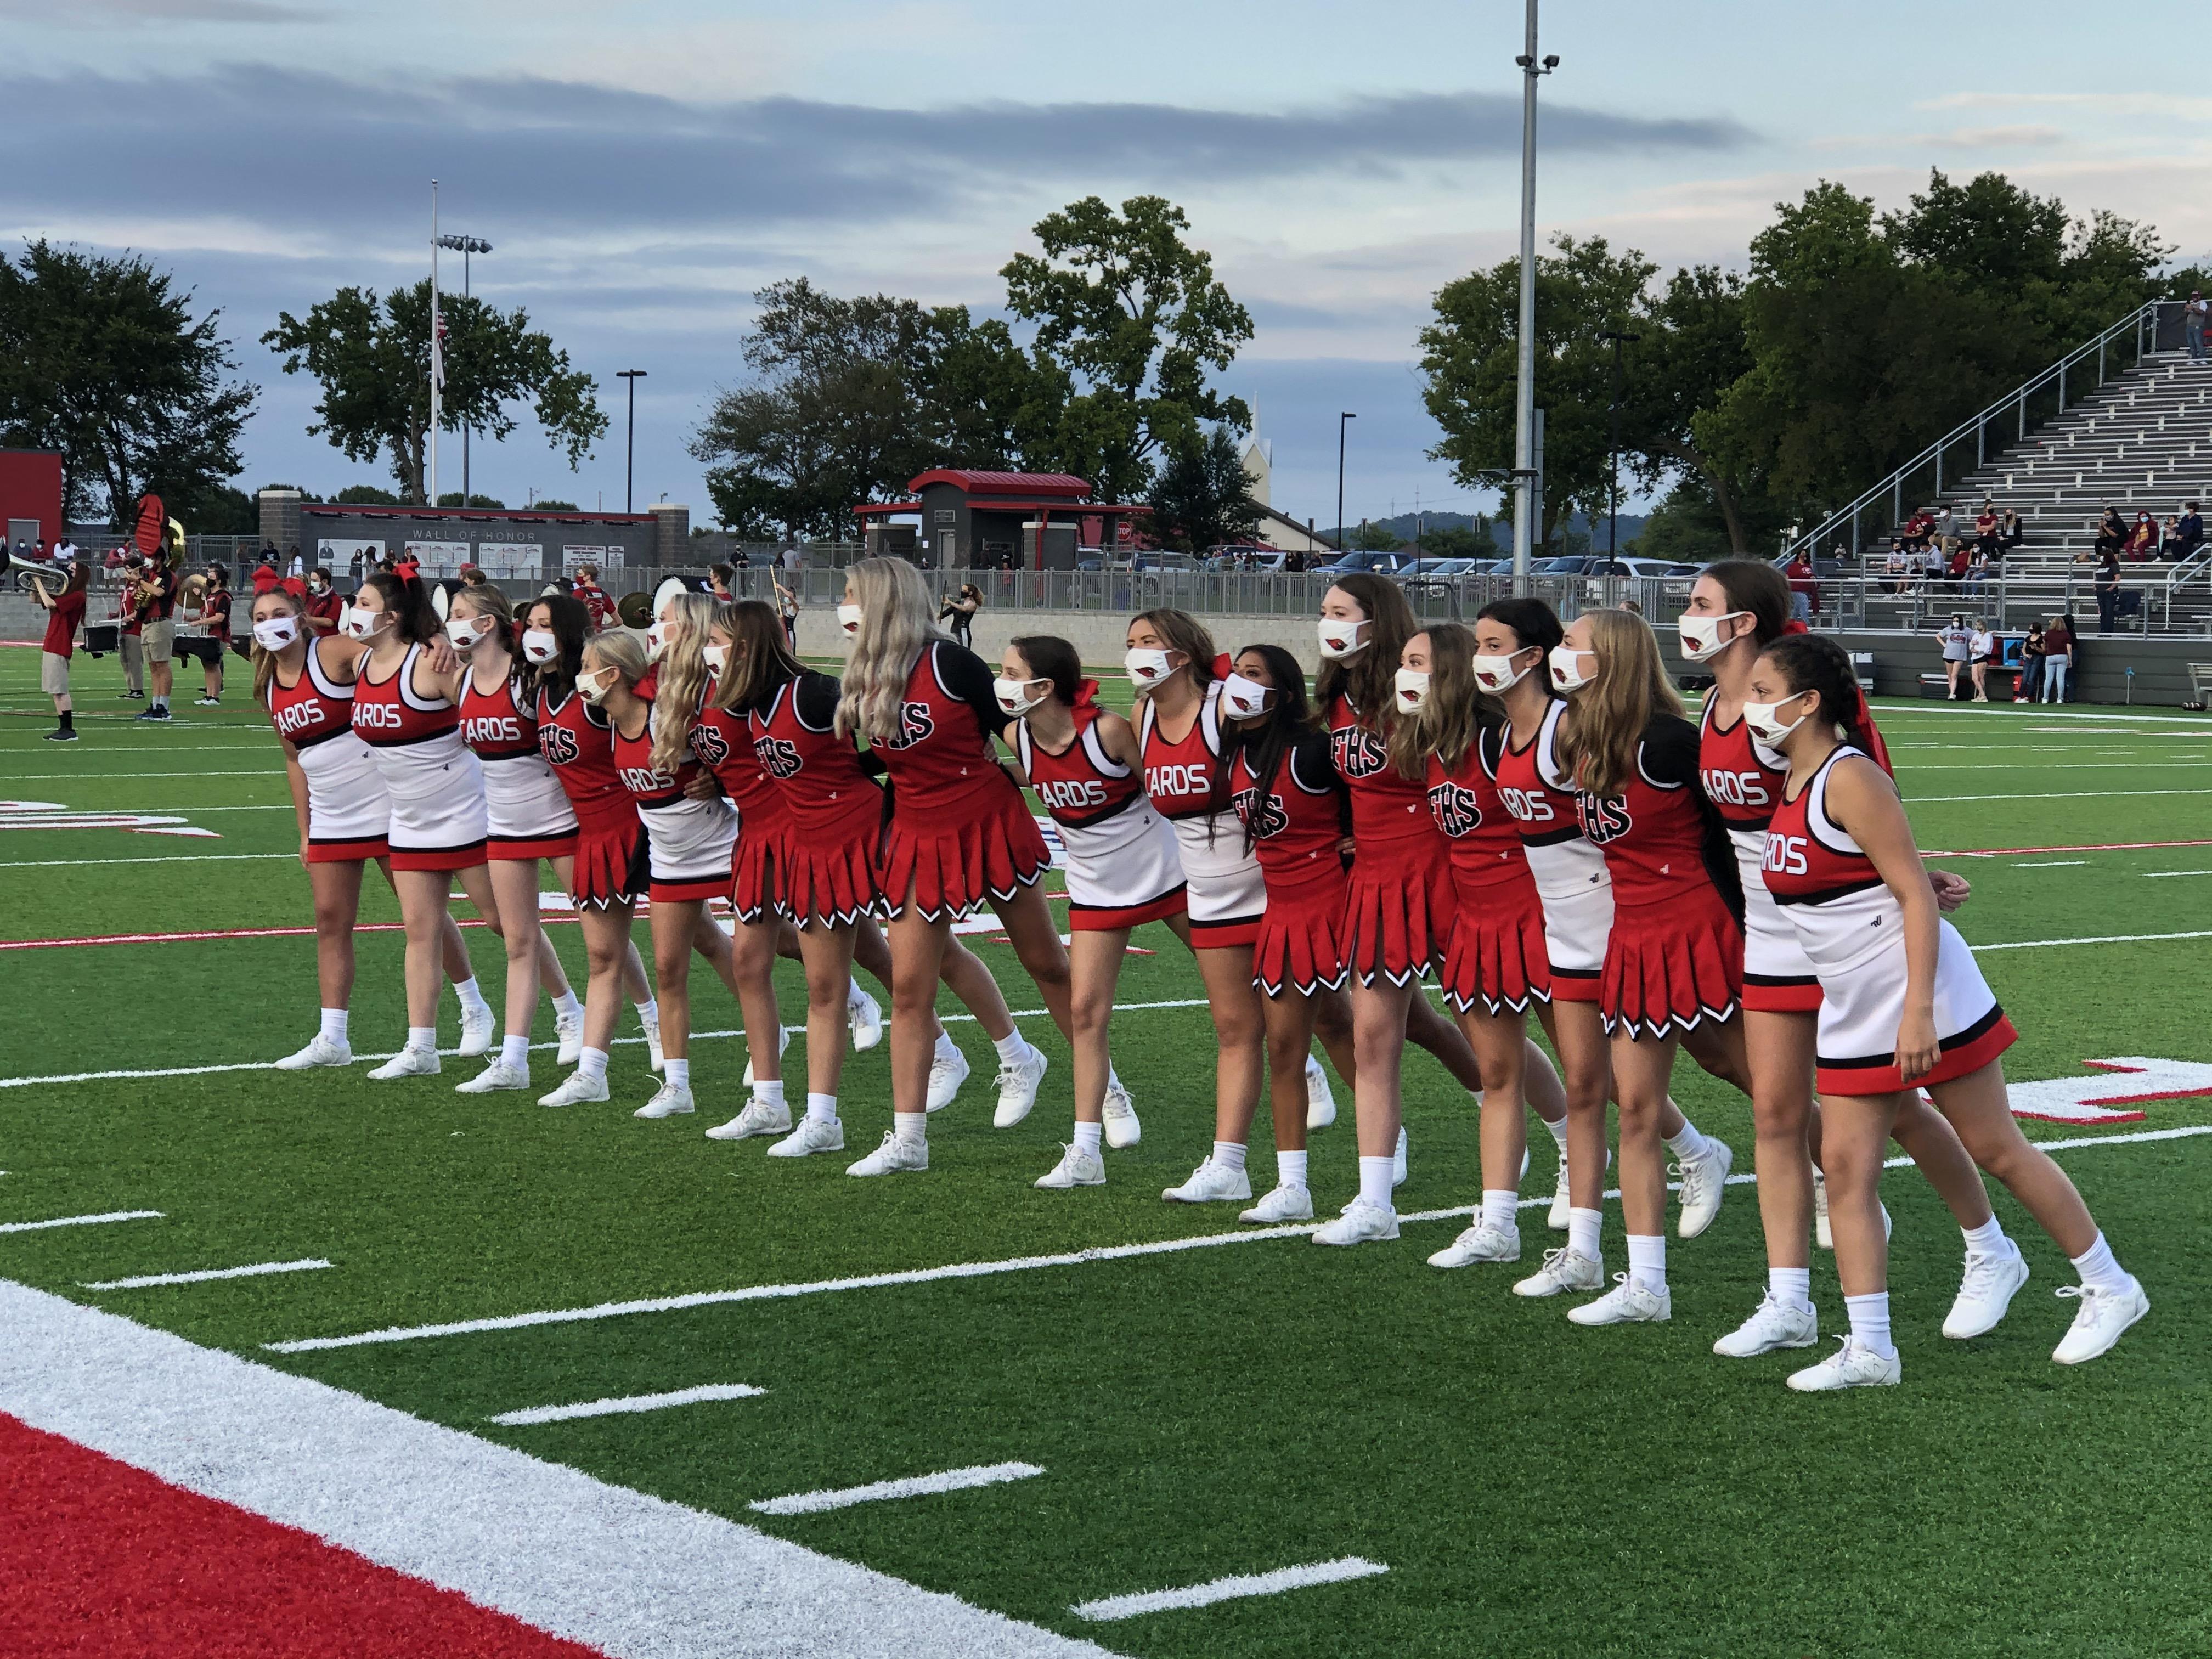 Cheerleaders on sideline